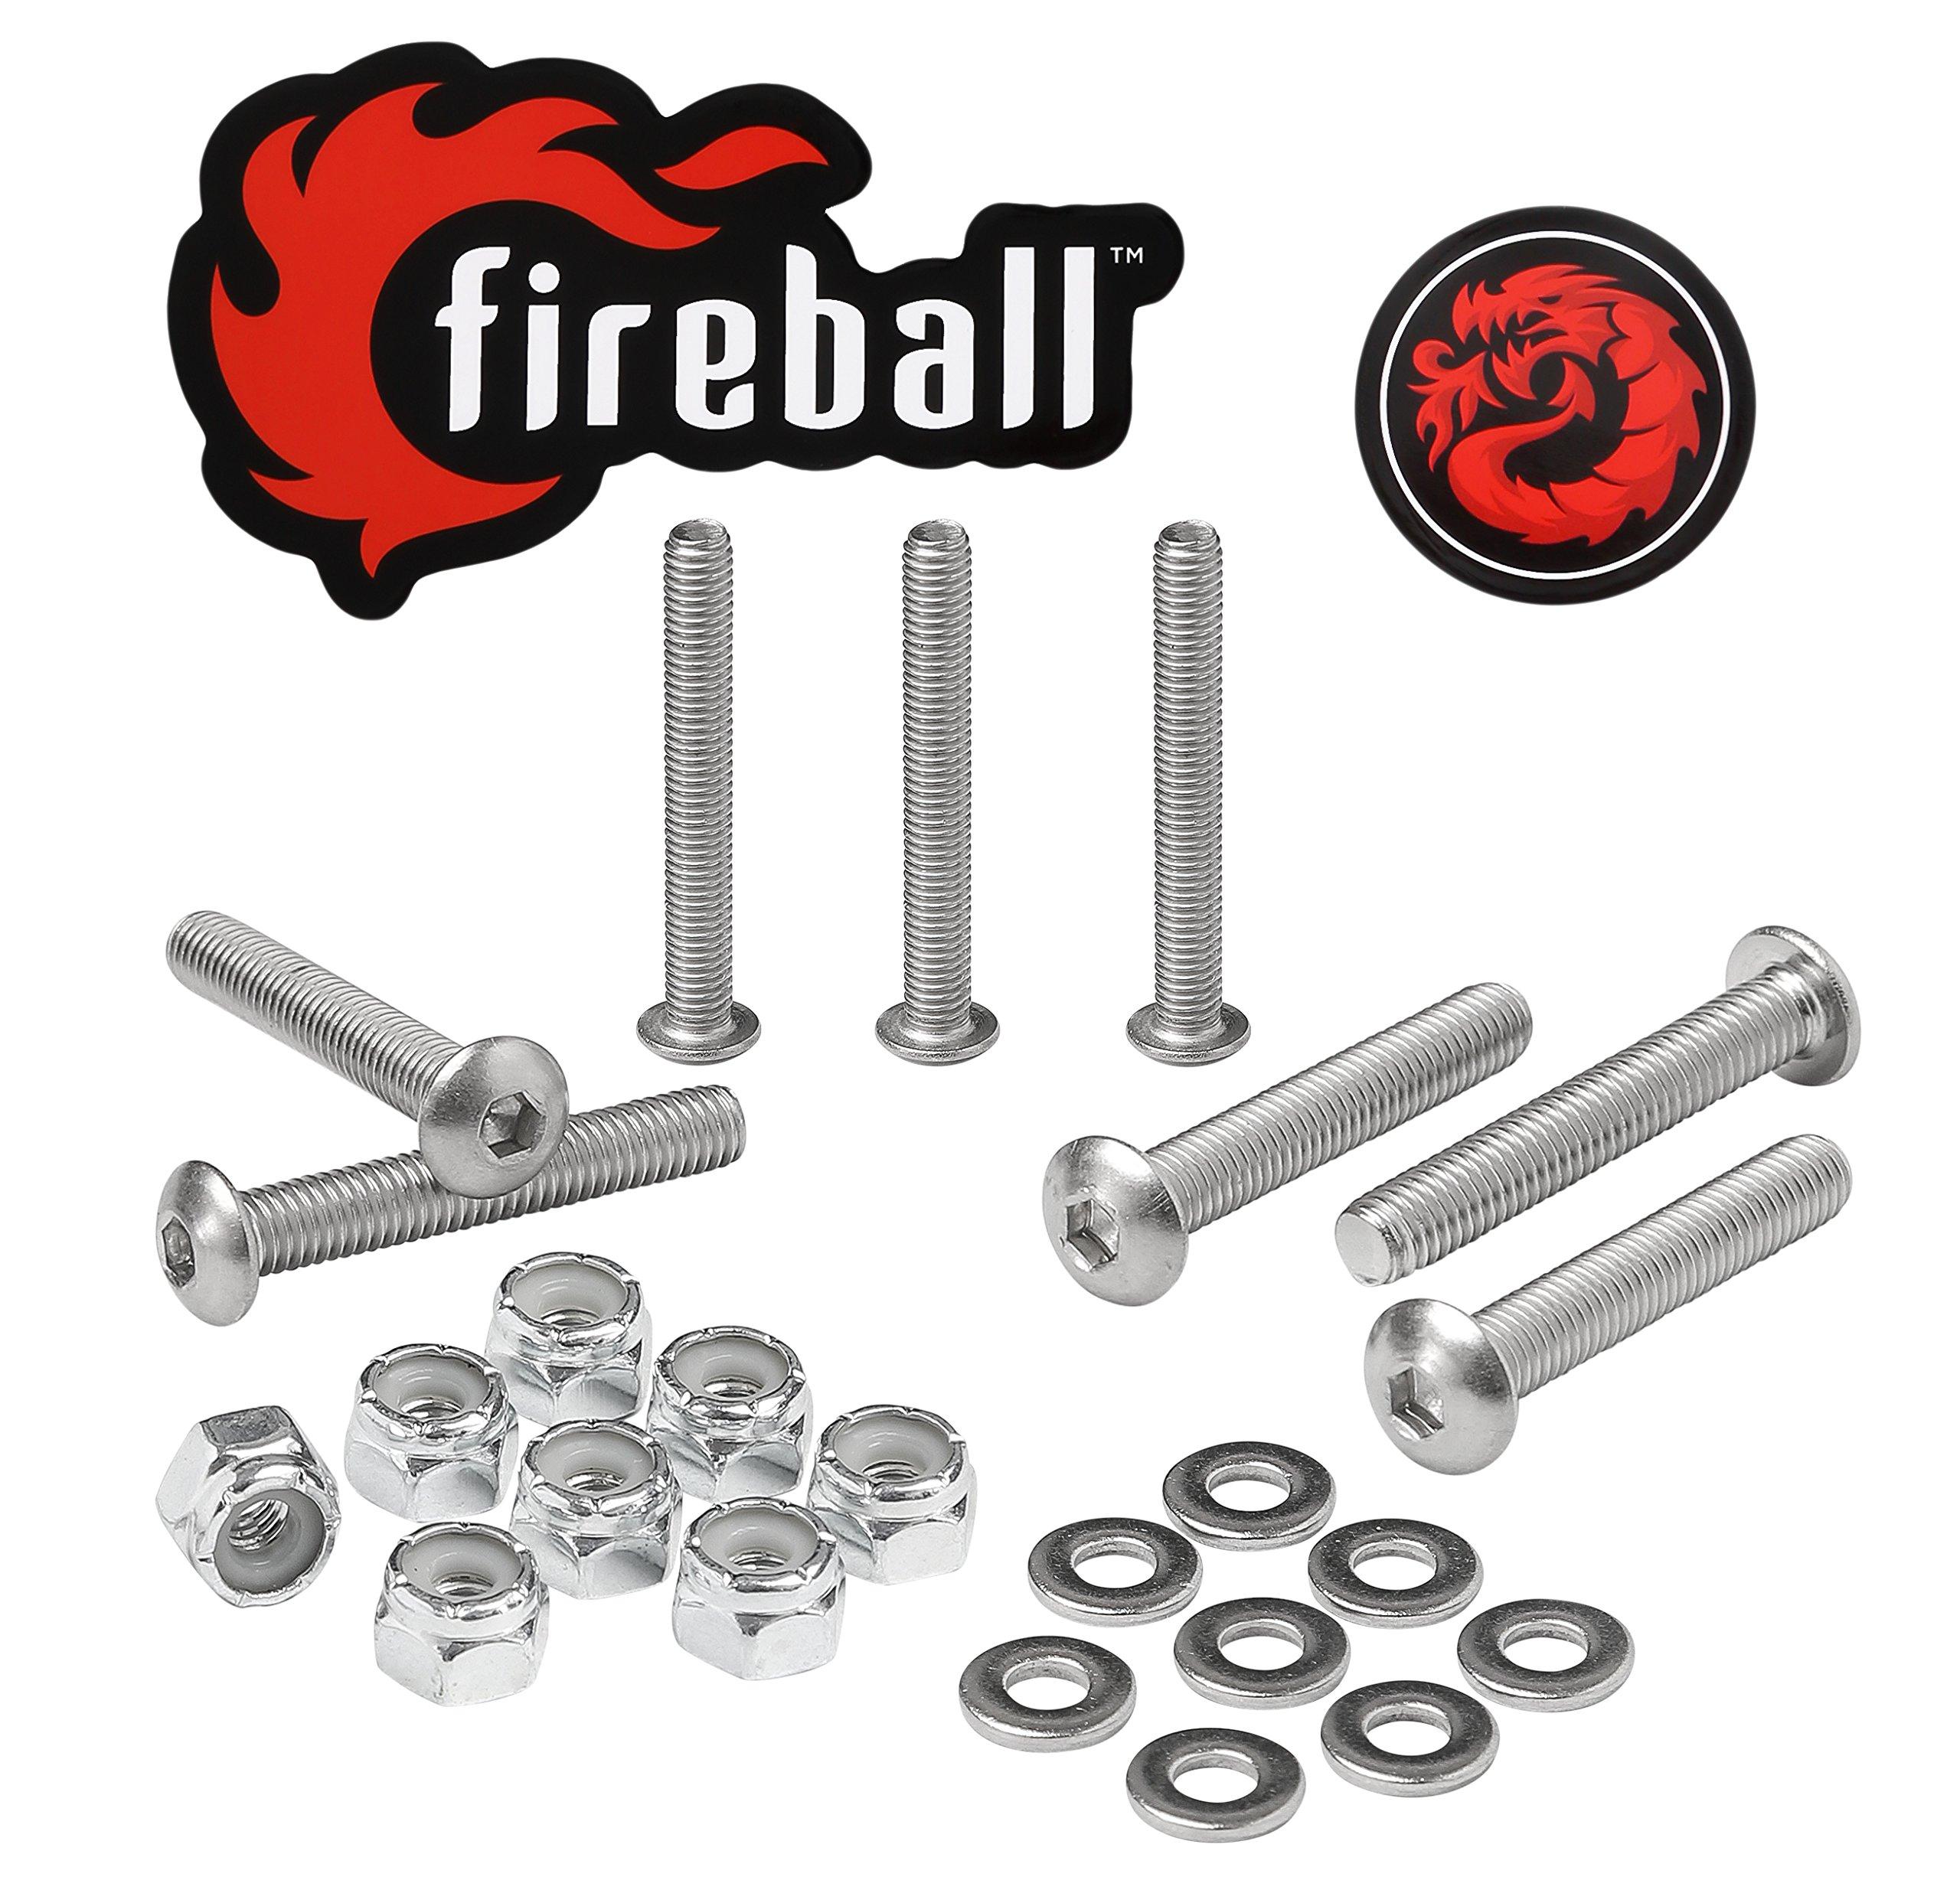 Fireball Dragon Stainless Steel Skateboard Hardware Set (Button Allen, 1.5'') by Fireball (Image #1)